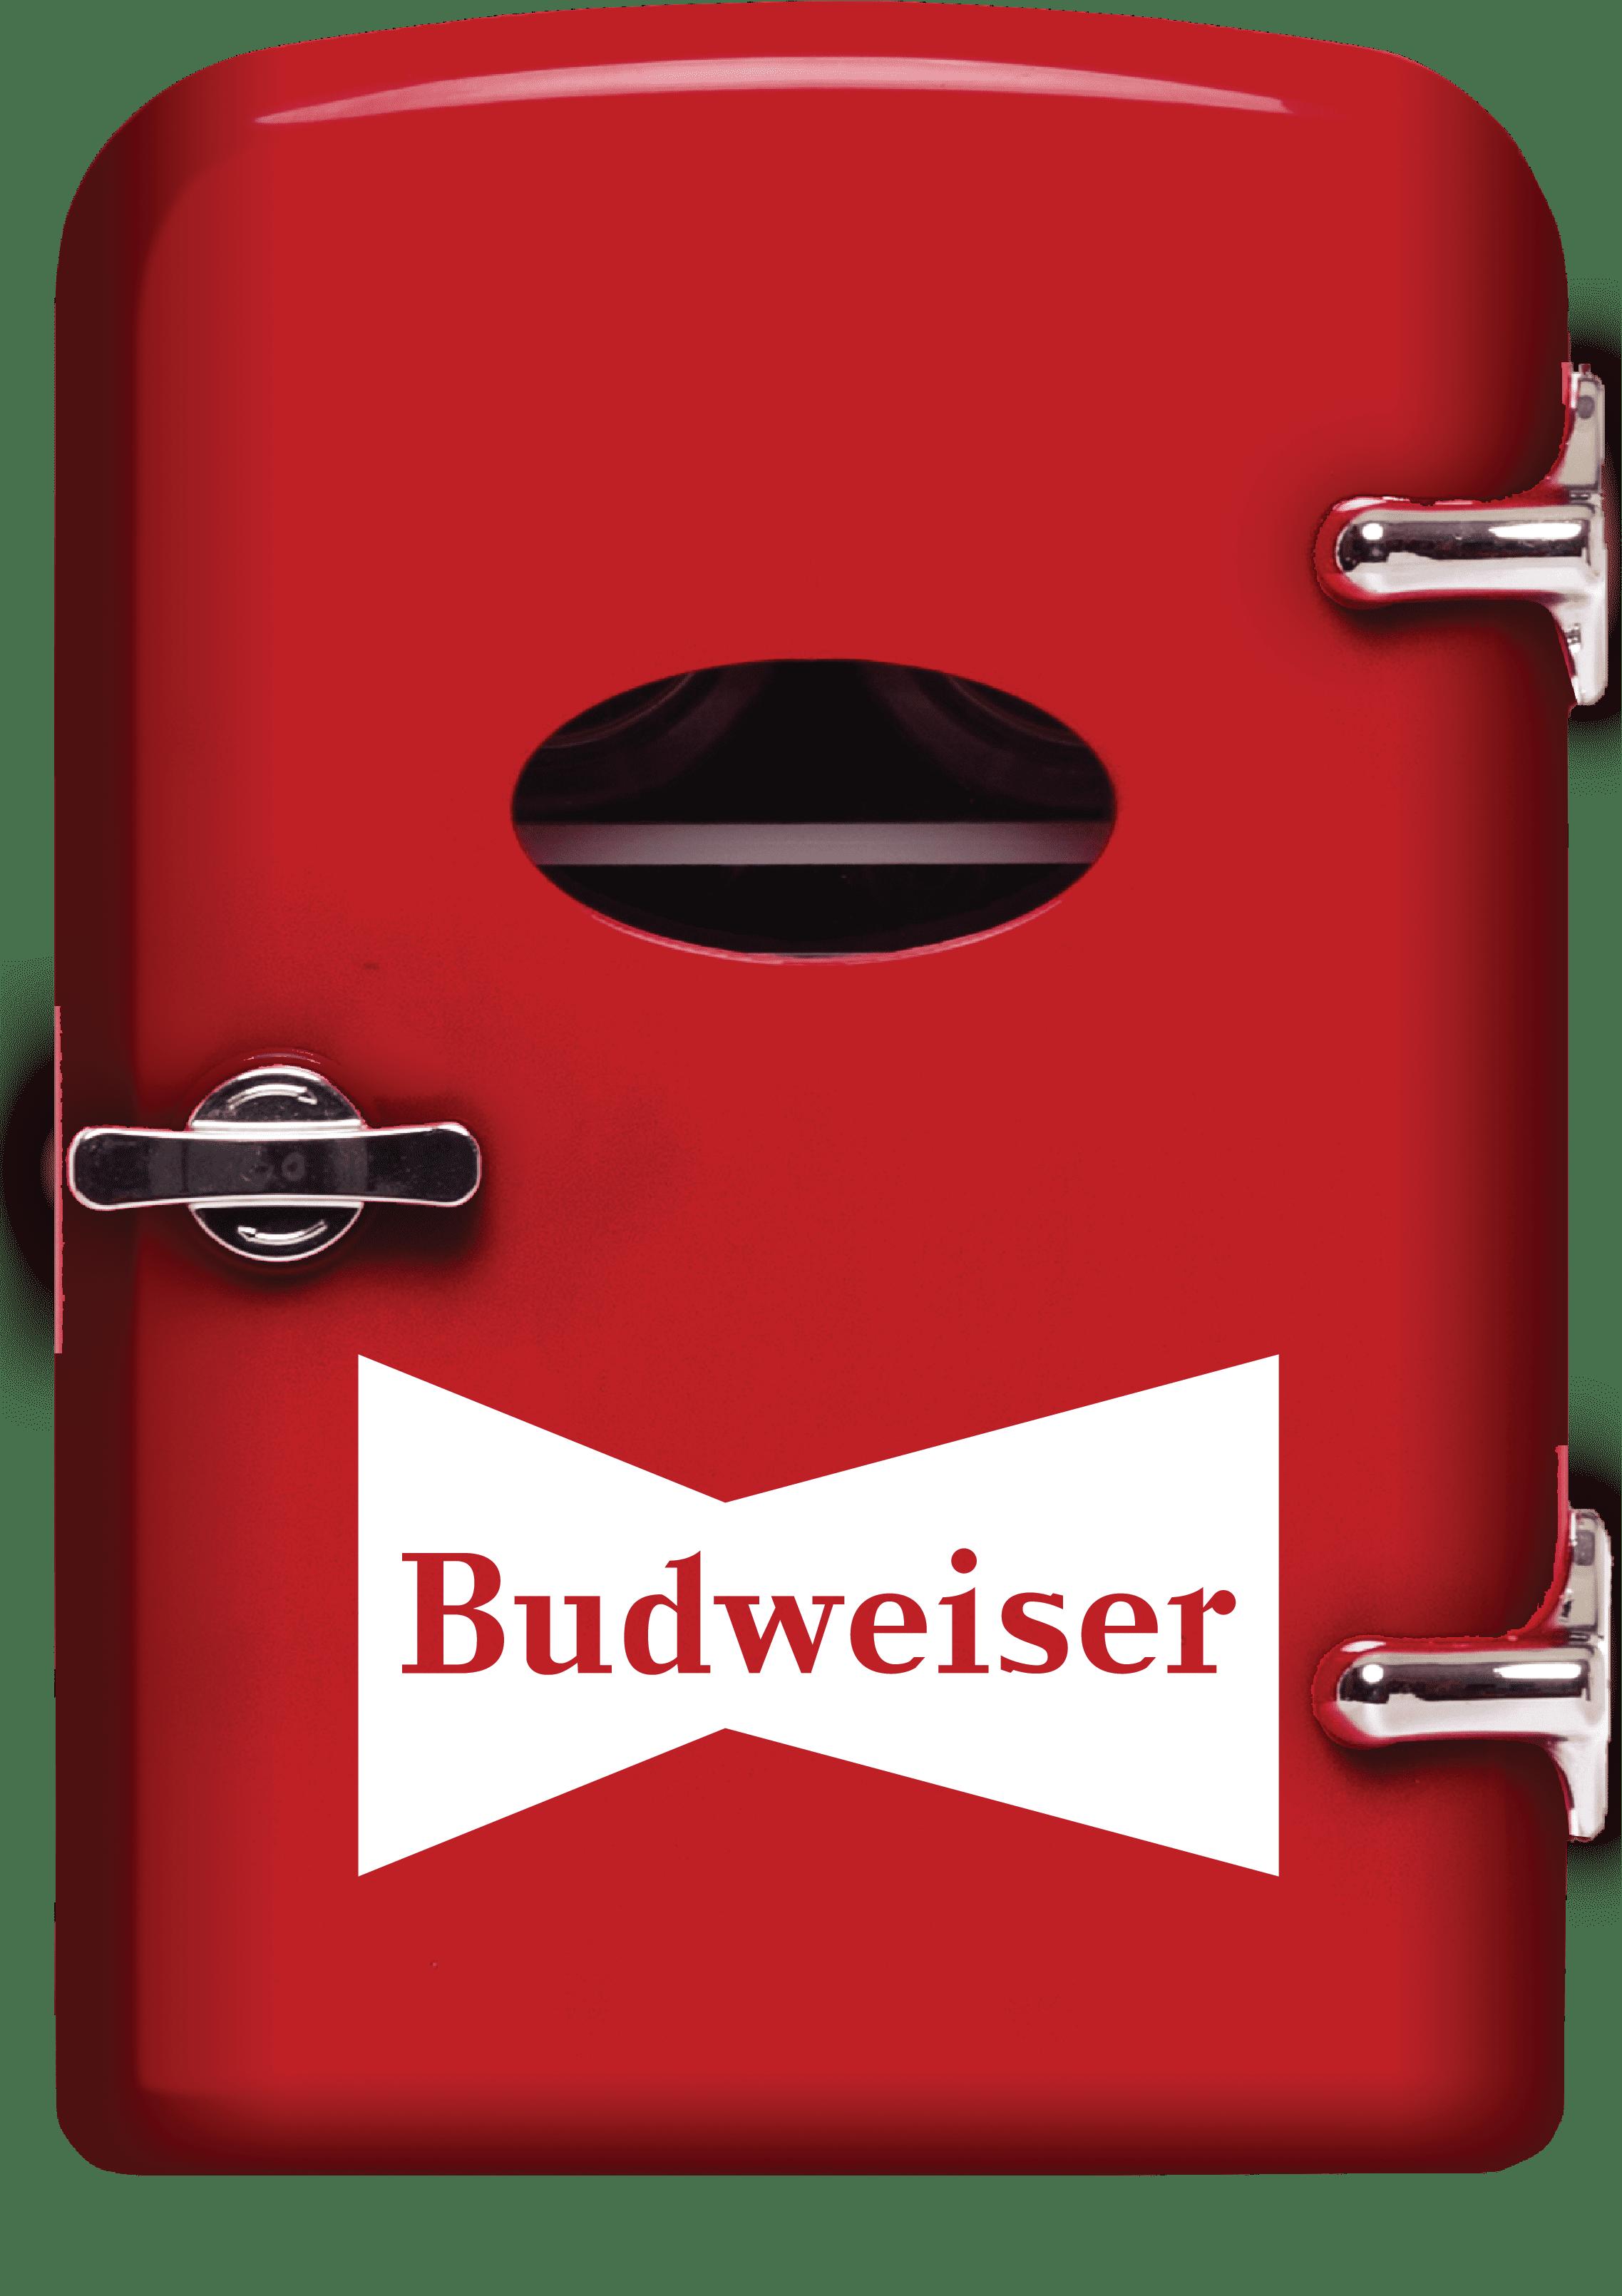 Budweiser Portable 6-can Mini Fridge, MIS135BUD, Red